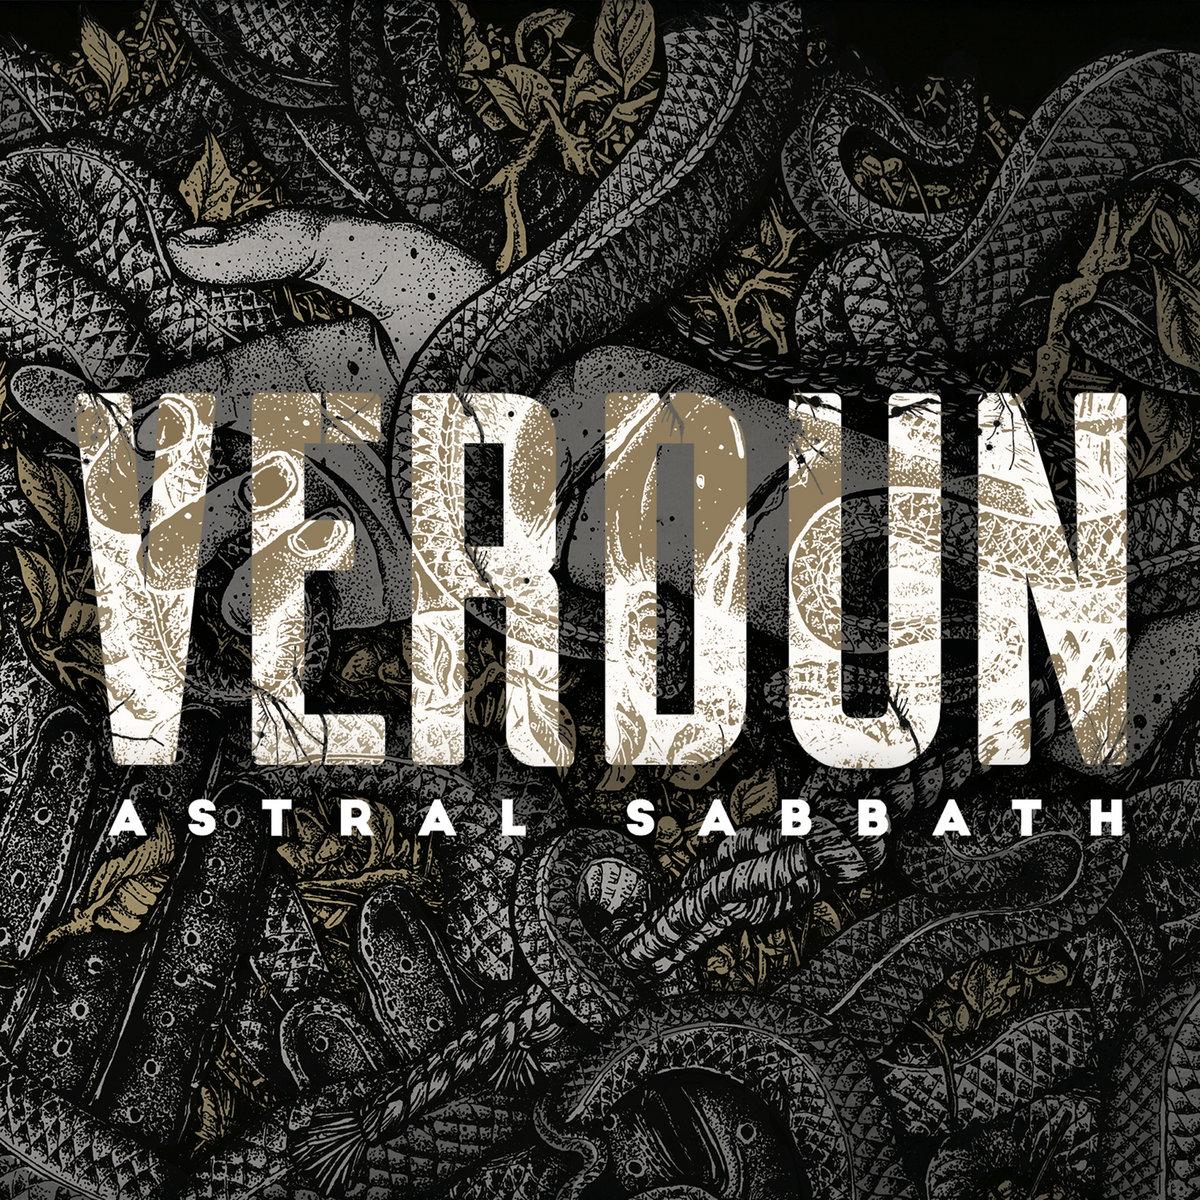 Astral Sabbath | Verdun